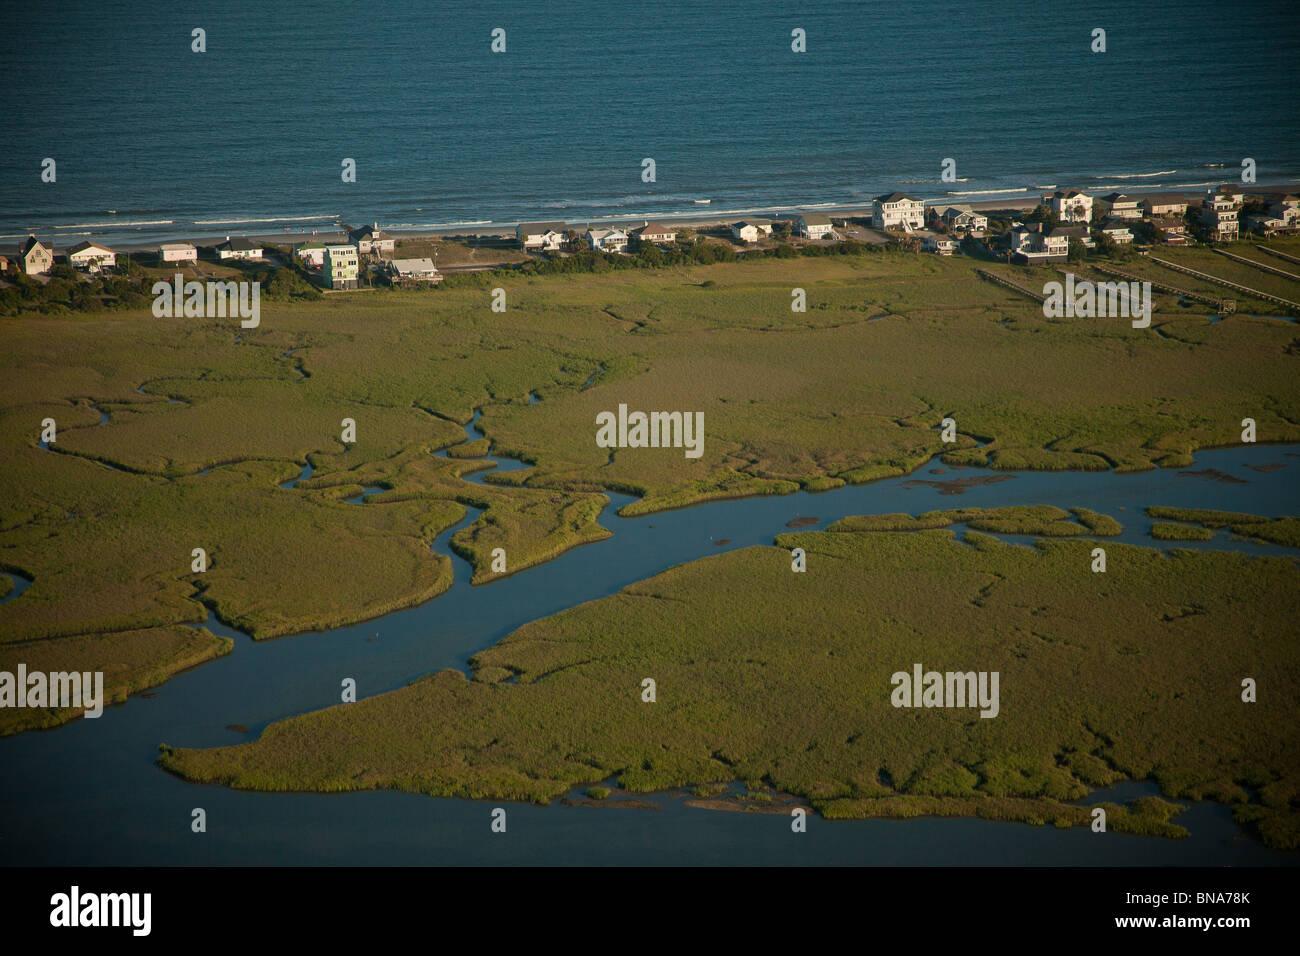 Homes along the coast on Folly Beach in Charleston, SC. - Stock Image